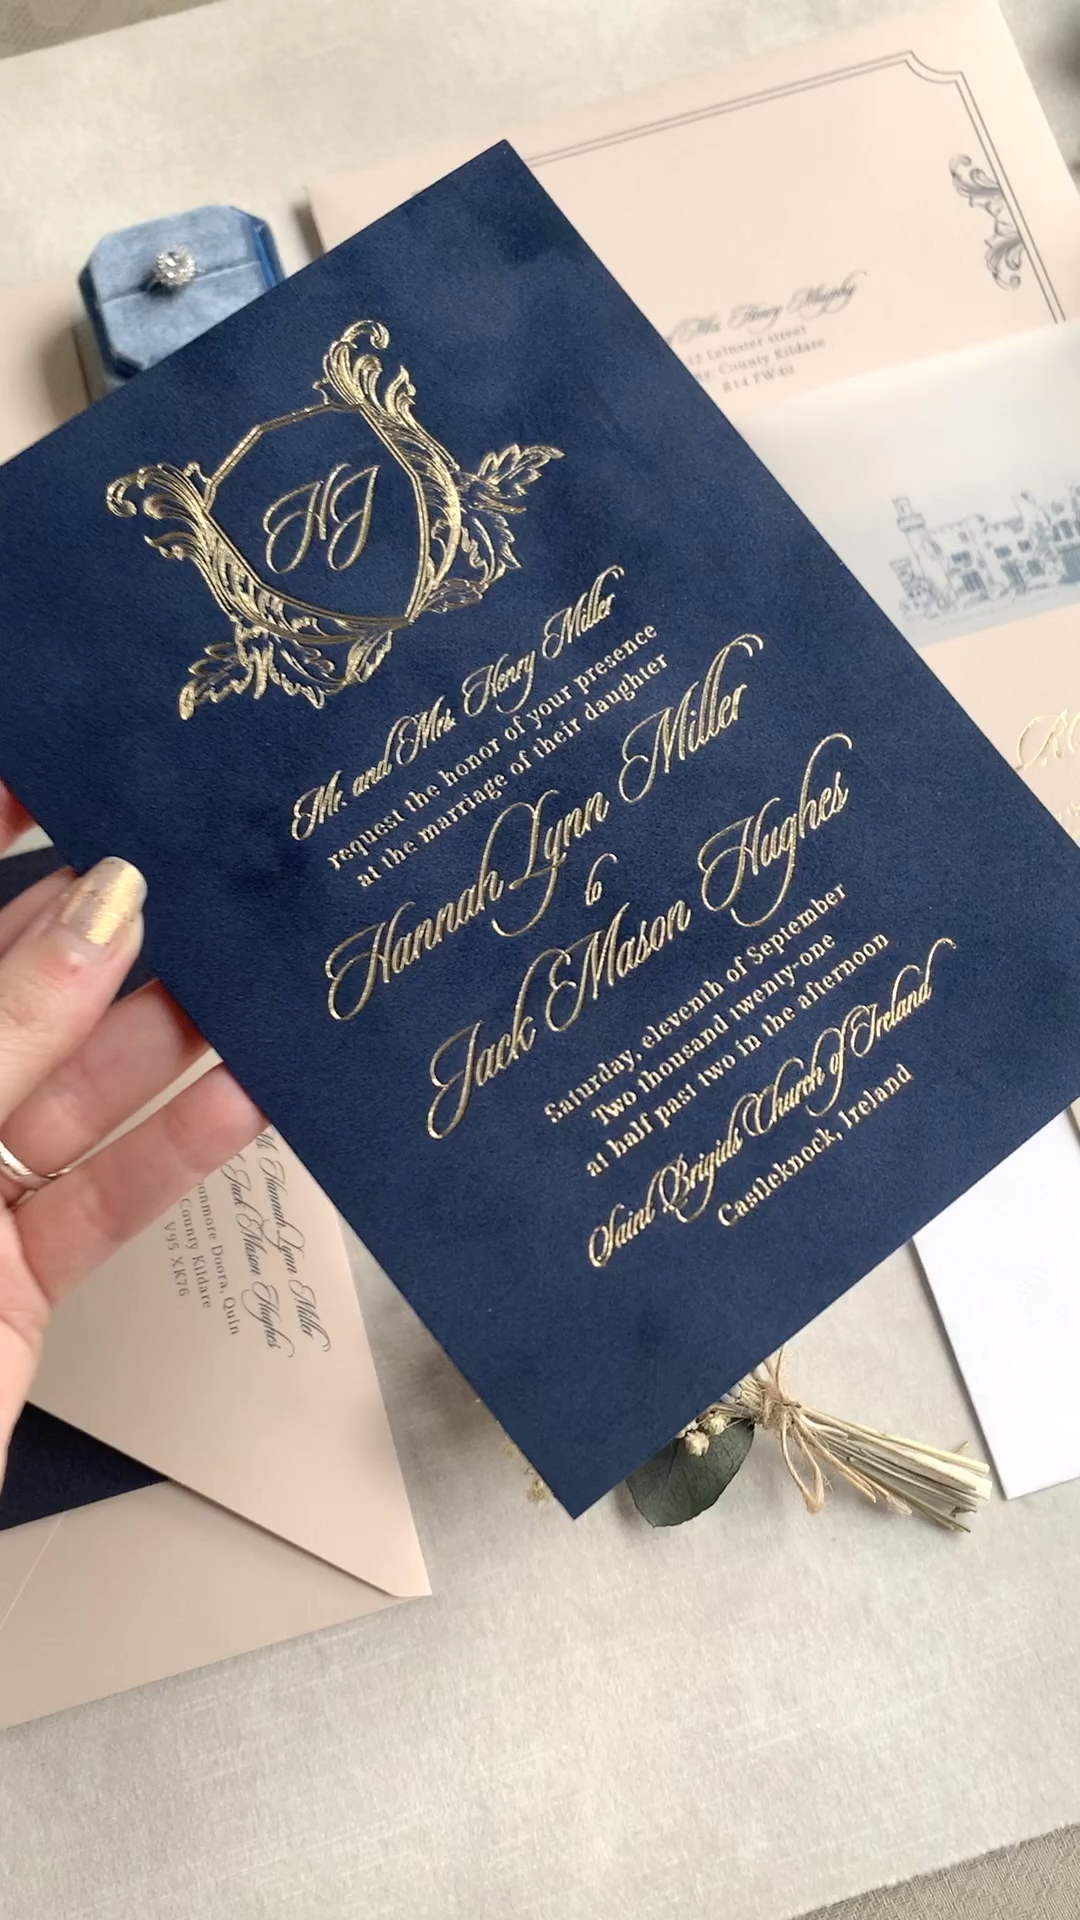 Velvet Wedding Invitations Luxury Video Wedding Invitation Cards Wedding Invitations Navy Wedding Invitations